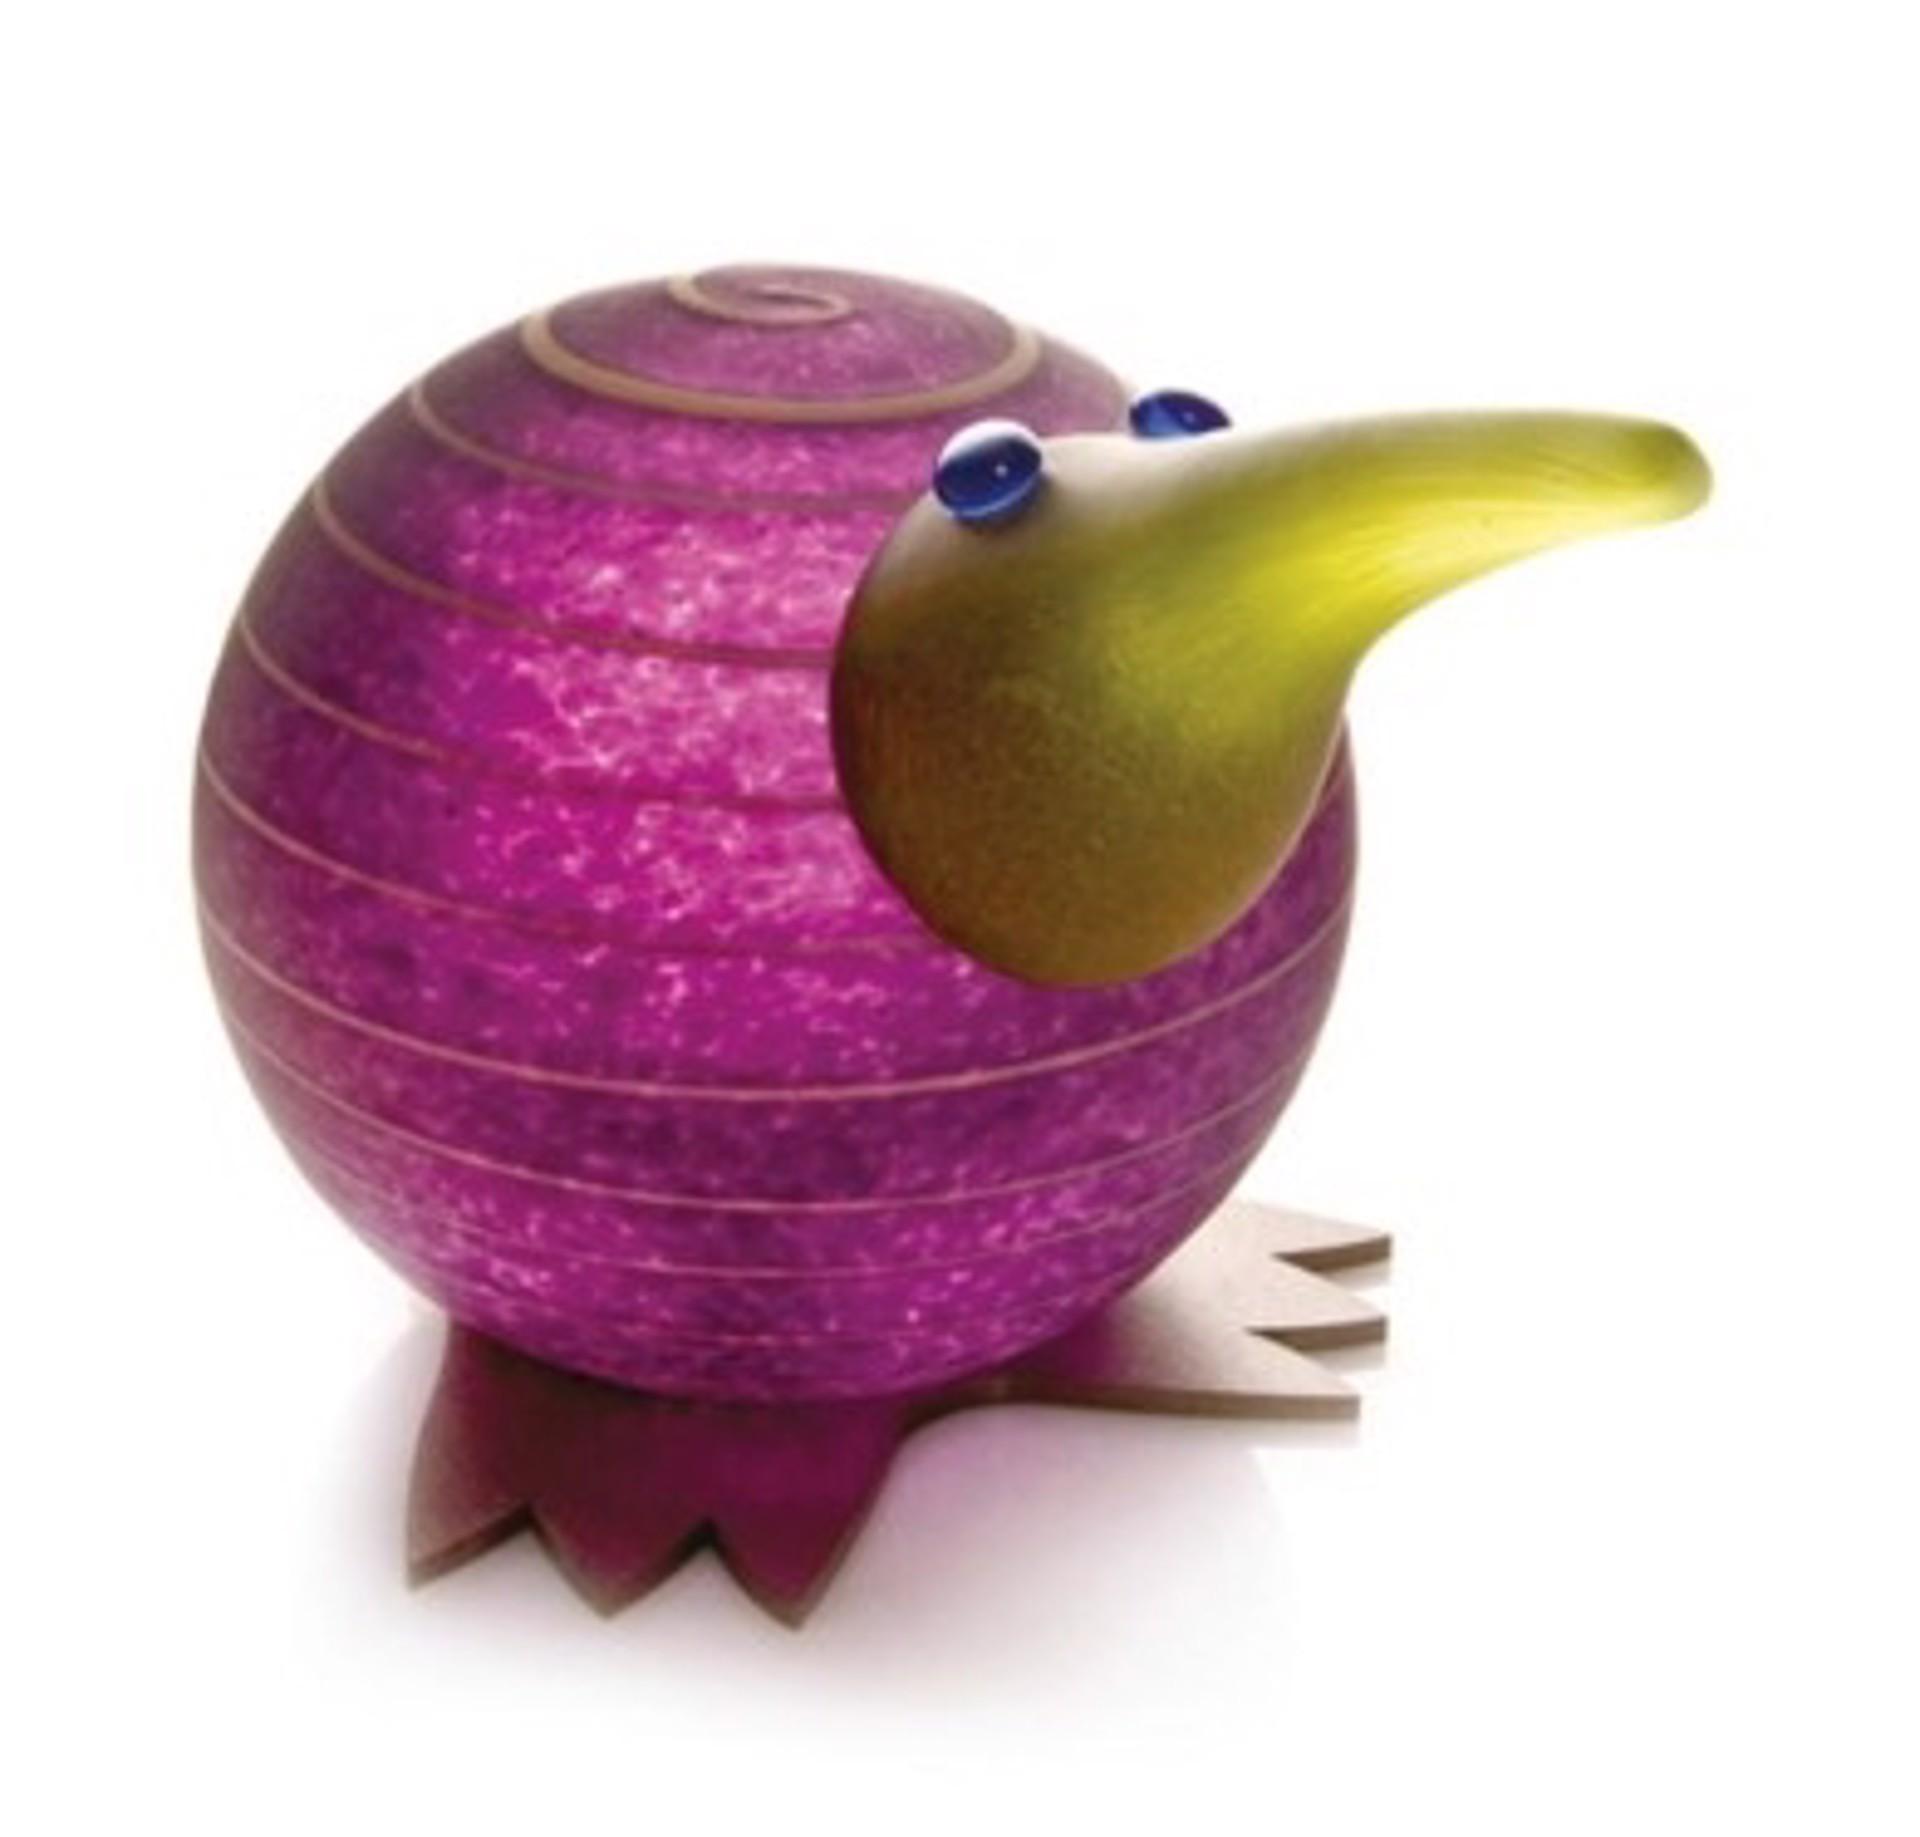 KIWI purple 24-02-44 by Borowski